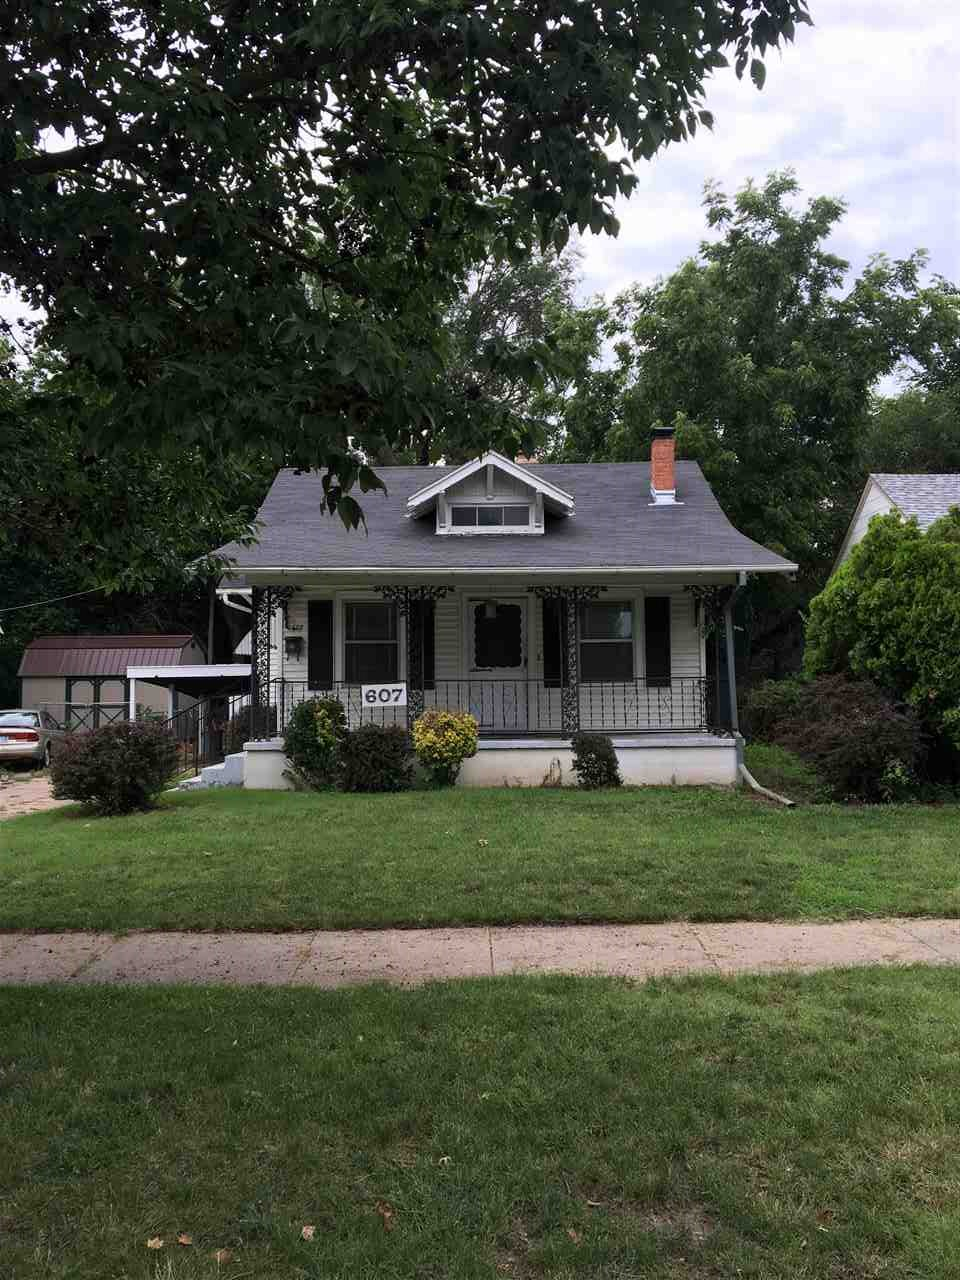 607 S Lorraine, Wichita, KS 67211